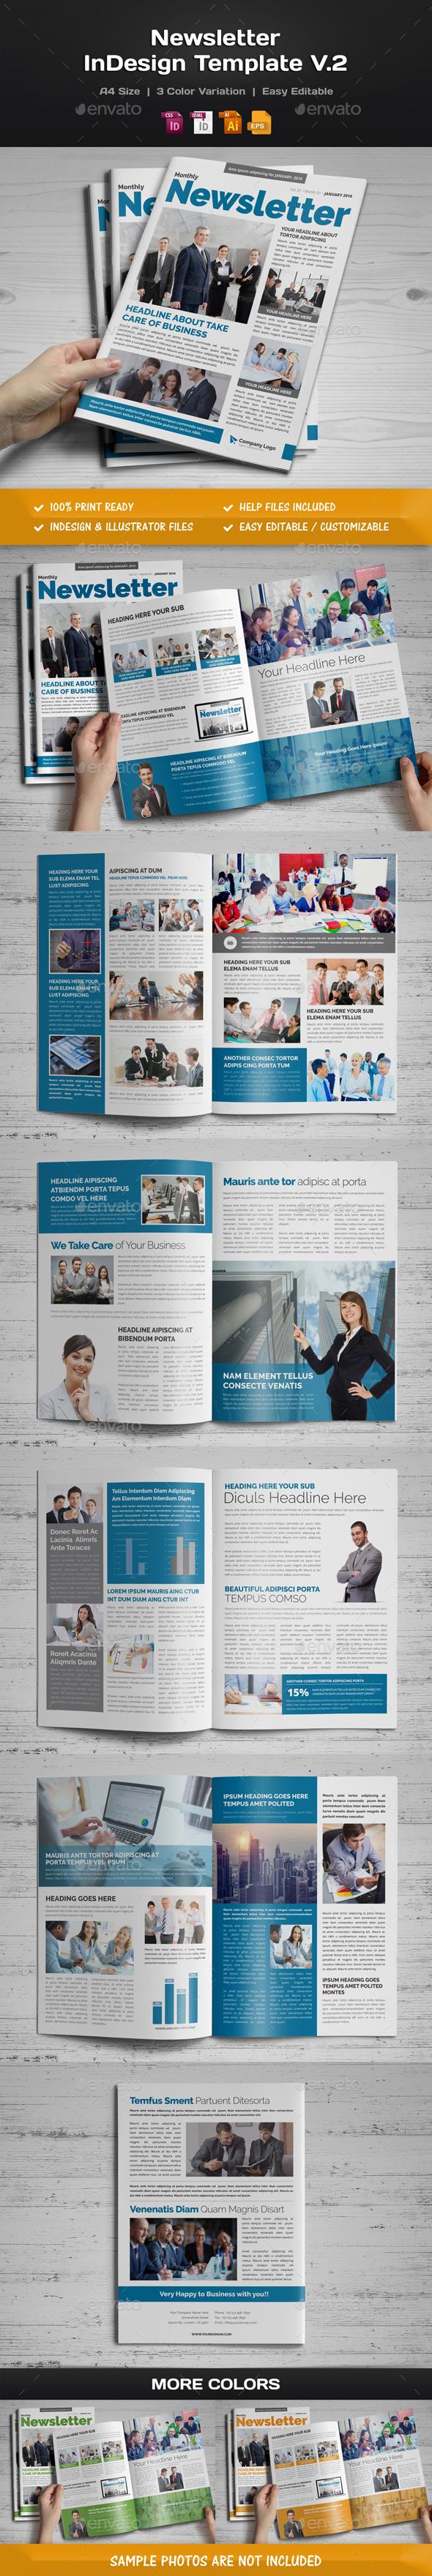 Newsletter Indesign Template v2 - Newsletters Print Templates